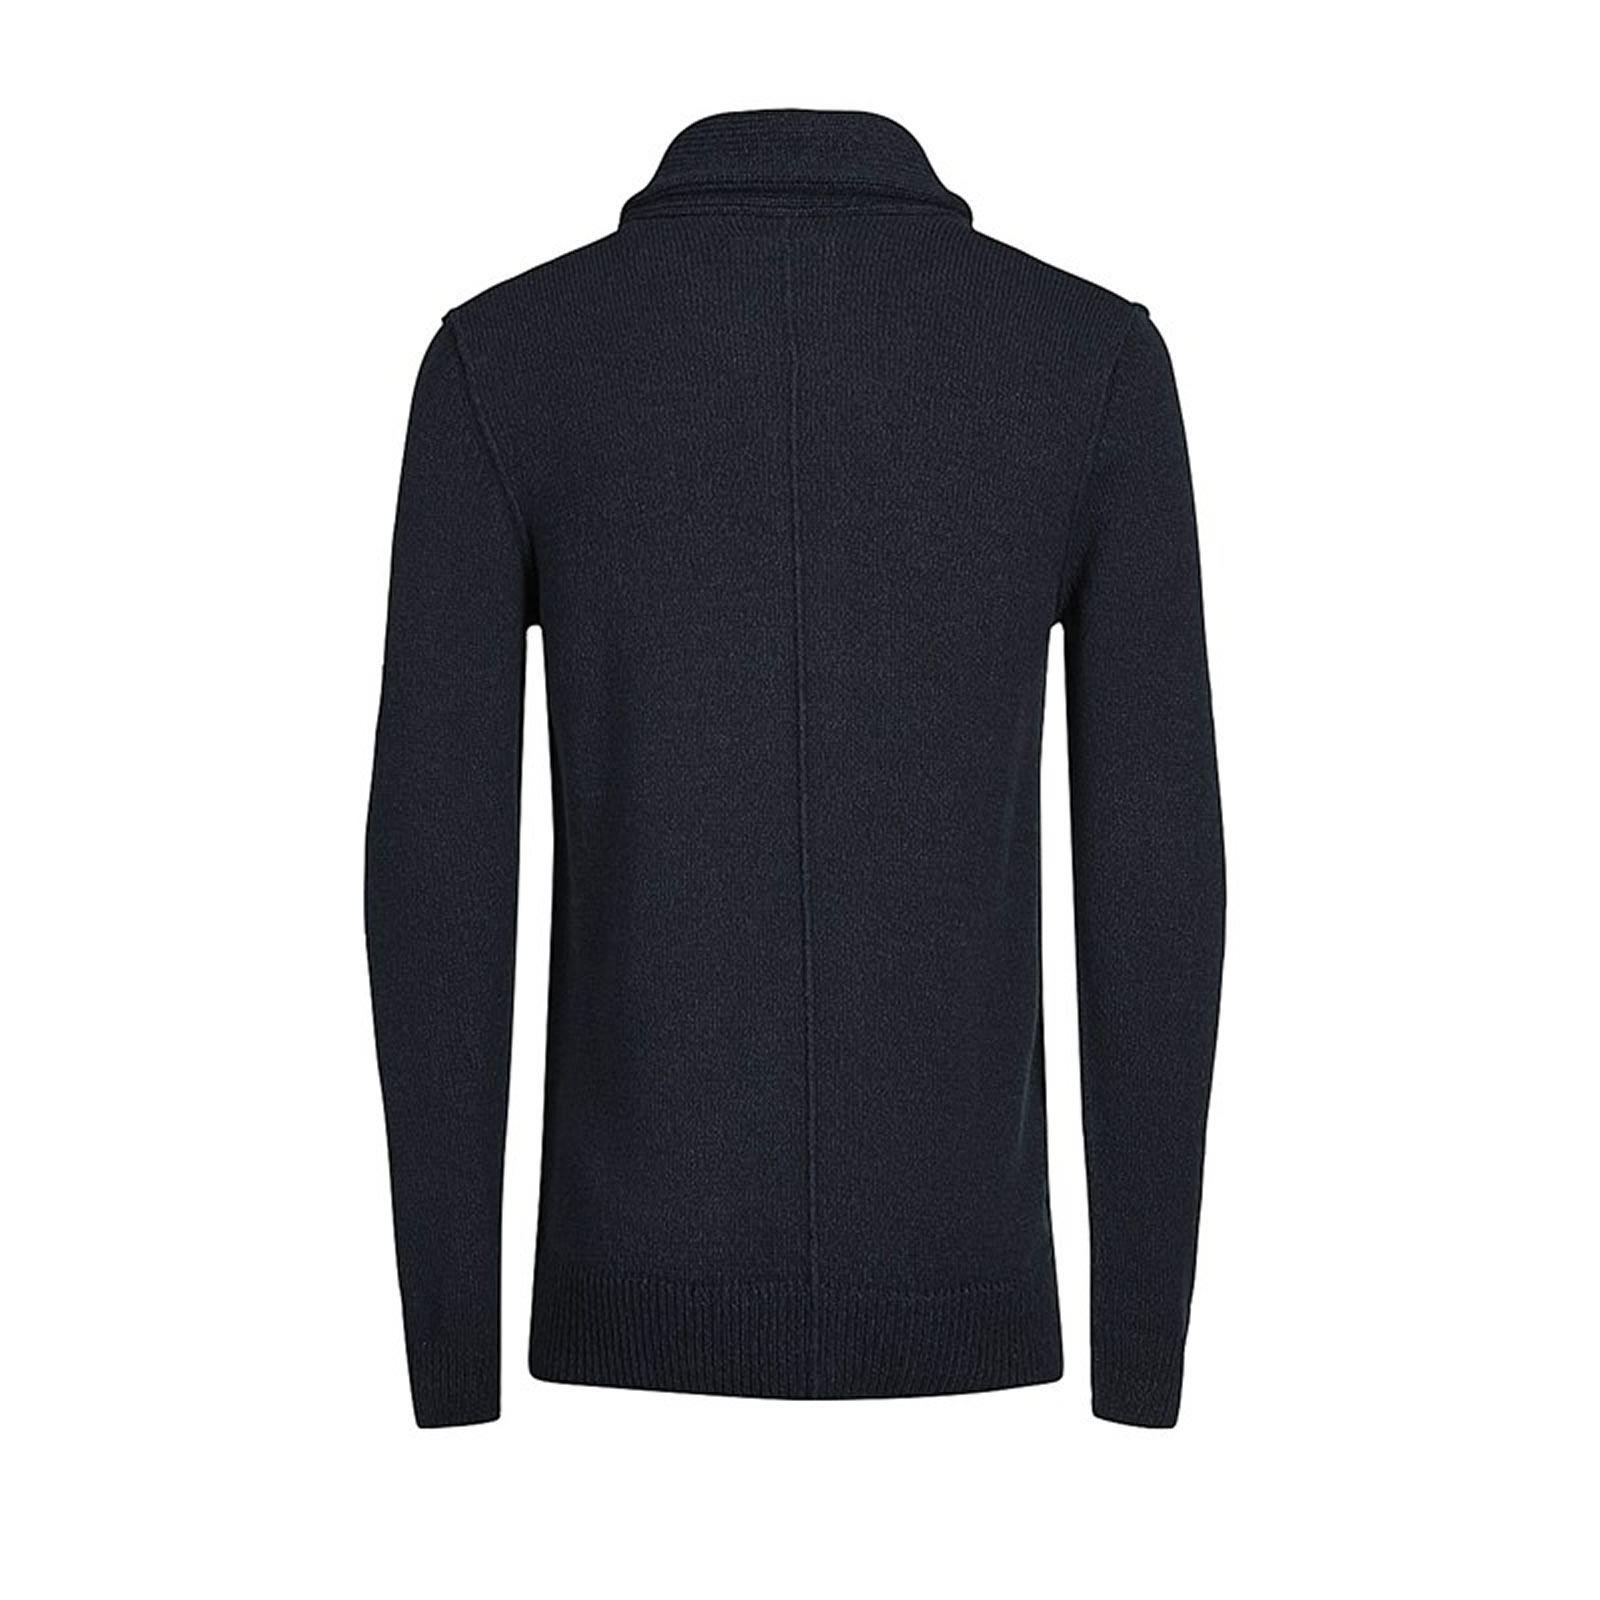 Mens Cardigan Jumper JACK /& JONES Inspect  Shawl Neck Button Up Sweater